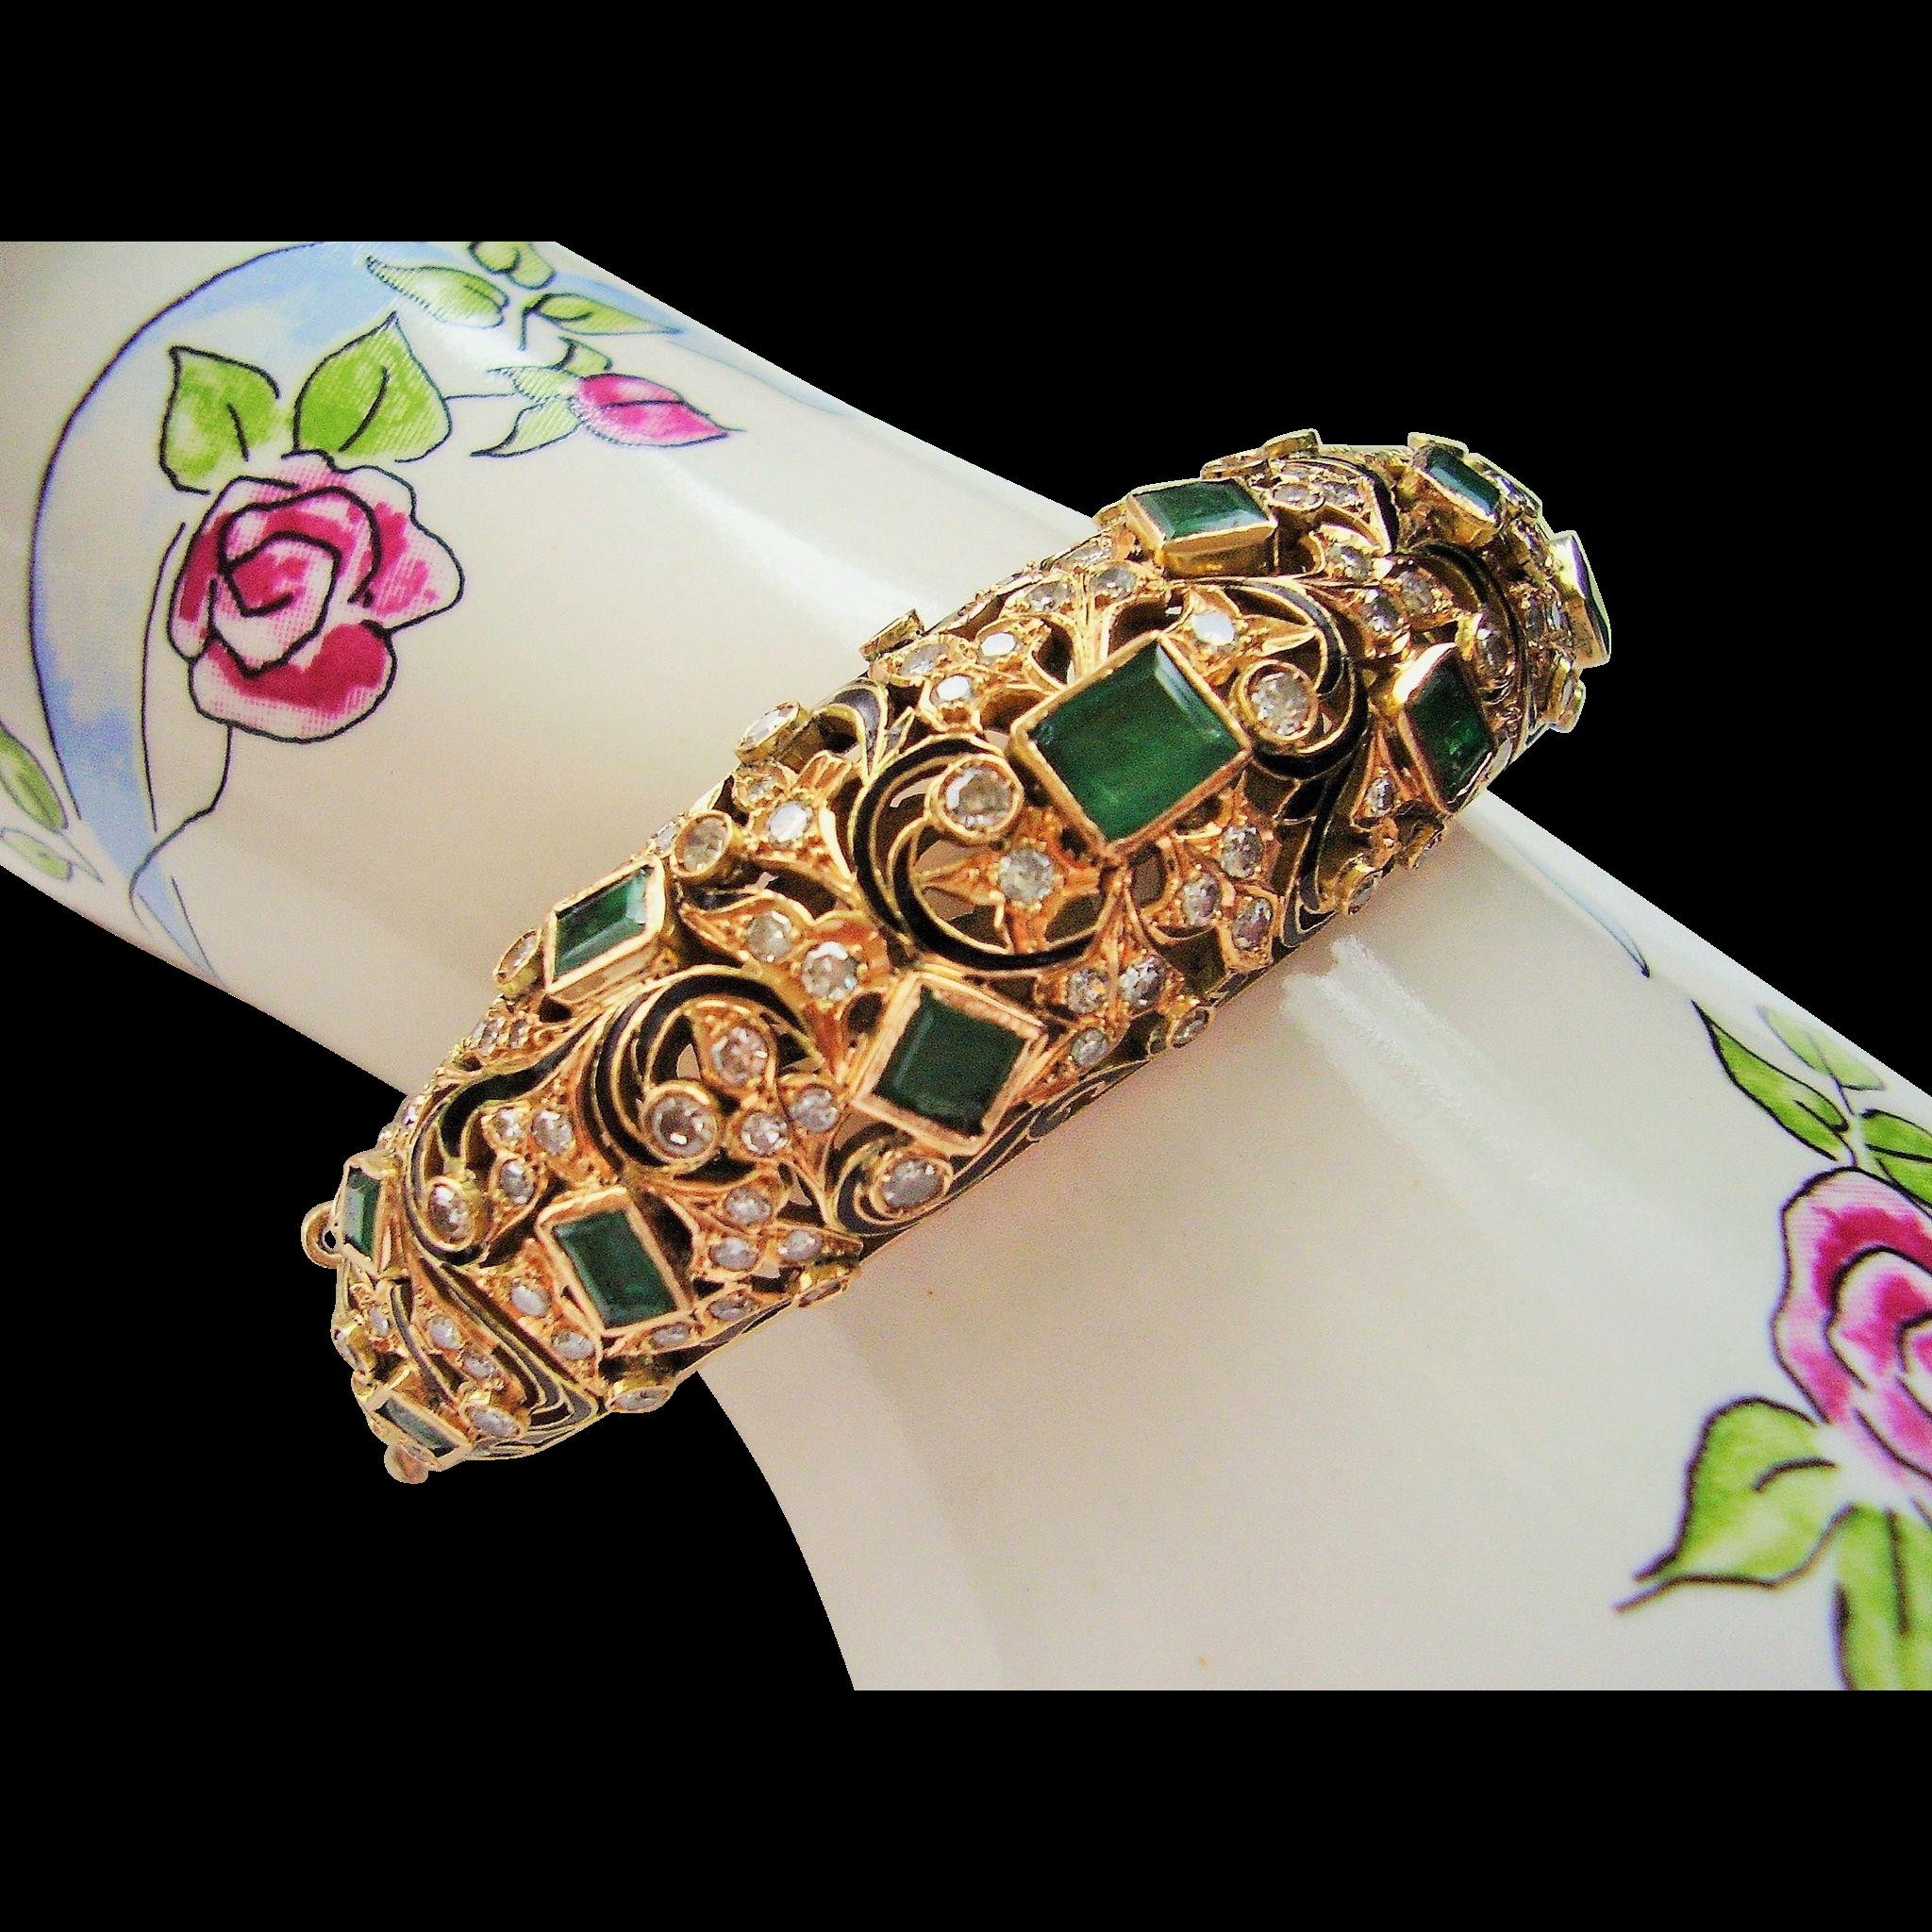 14 Kt Gold Bracelet Emerald Diamond Estate Antique 42 6 Grams Fine Jewel Encrusted European Handmade Bangle